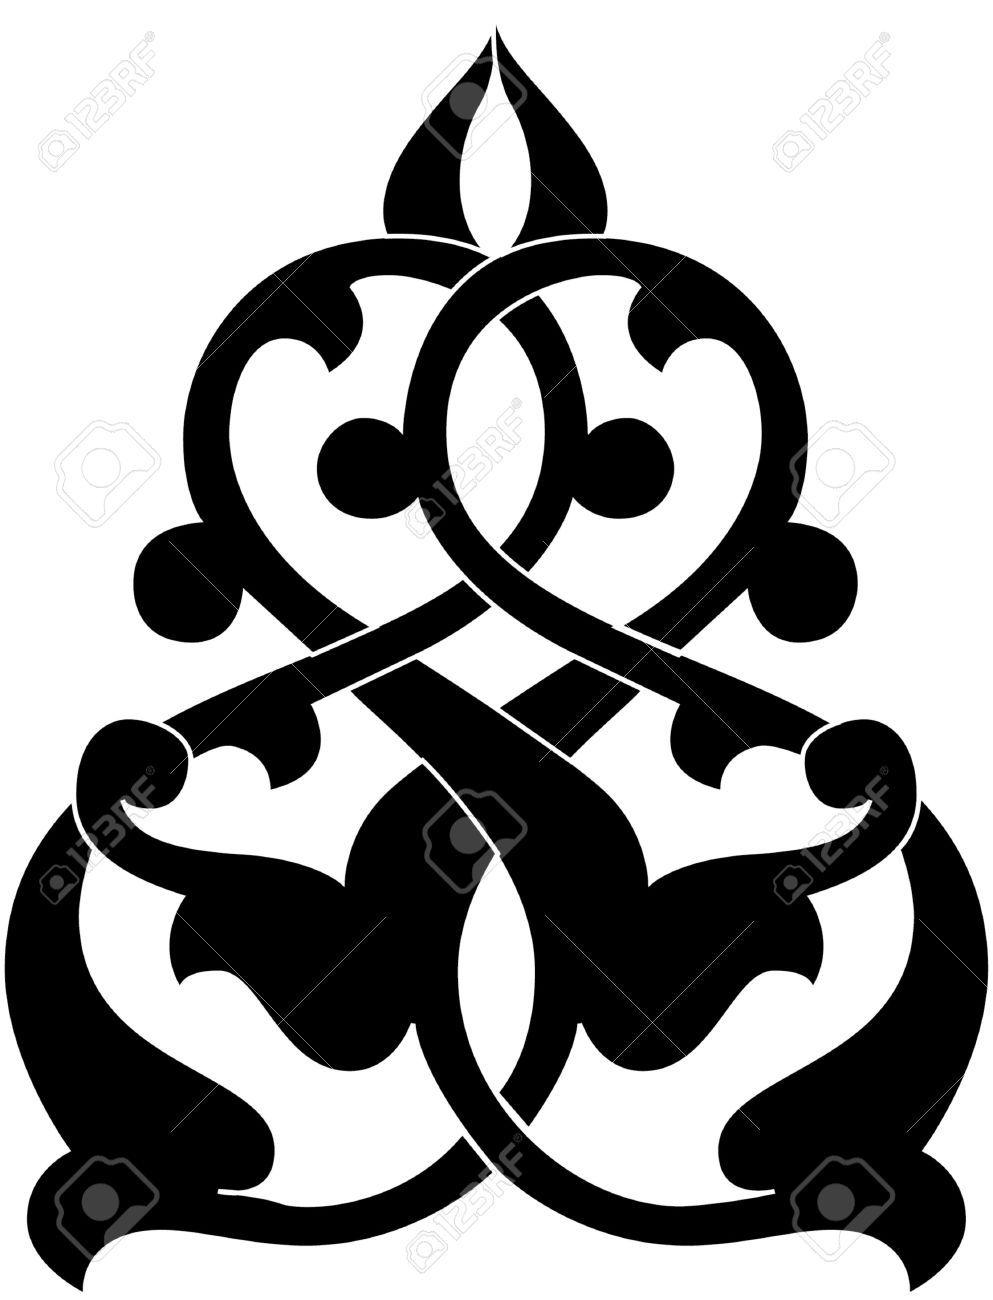 Decorative Design Element, Vector File, Monochrome Royalty ...